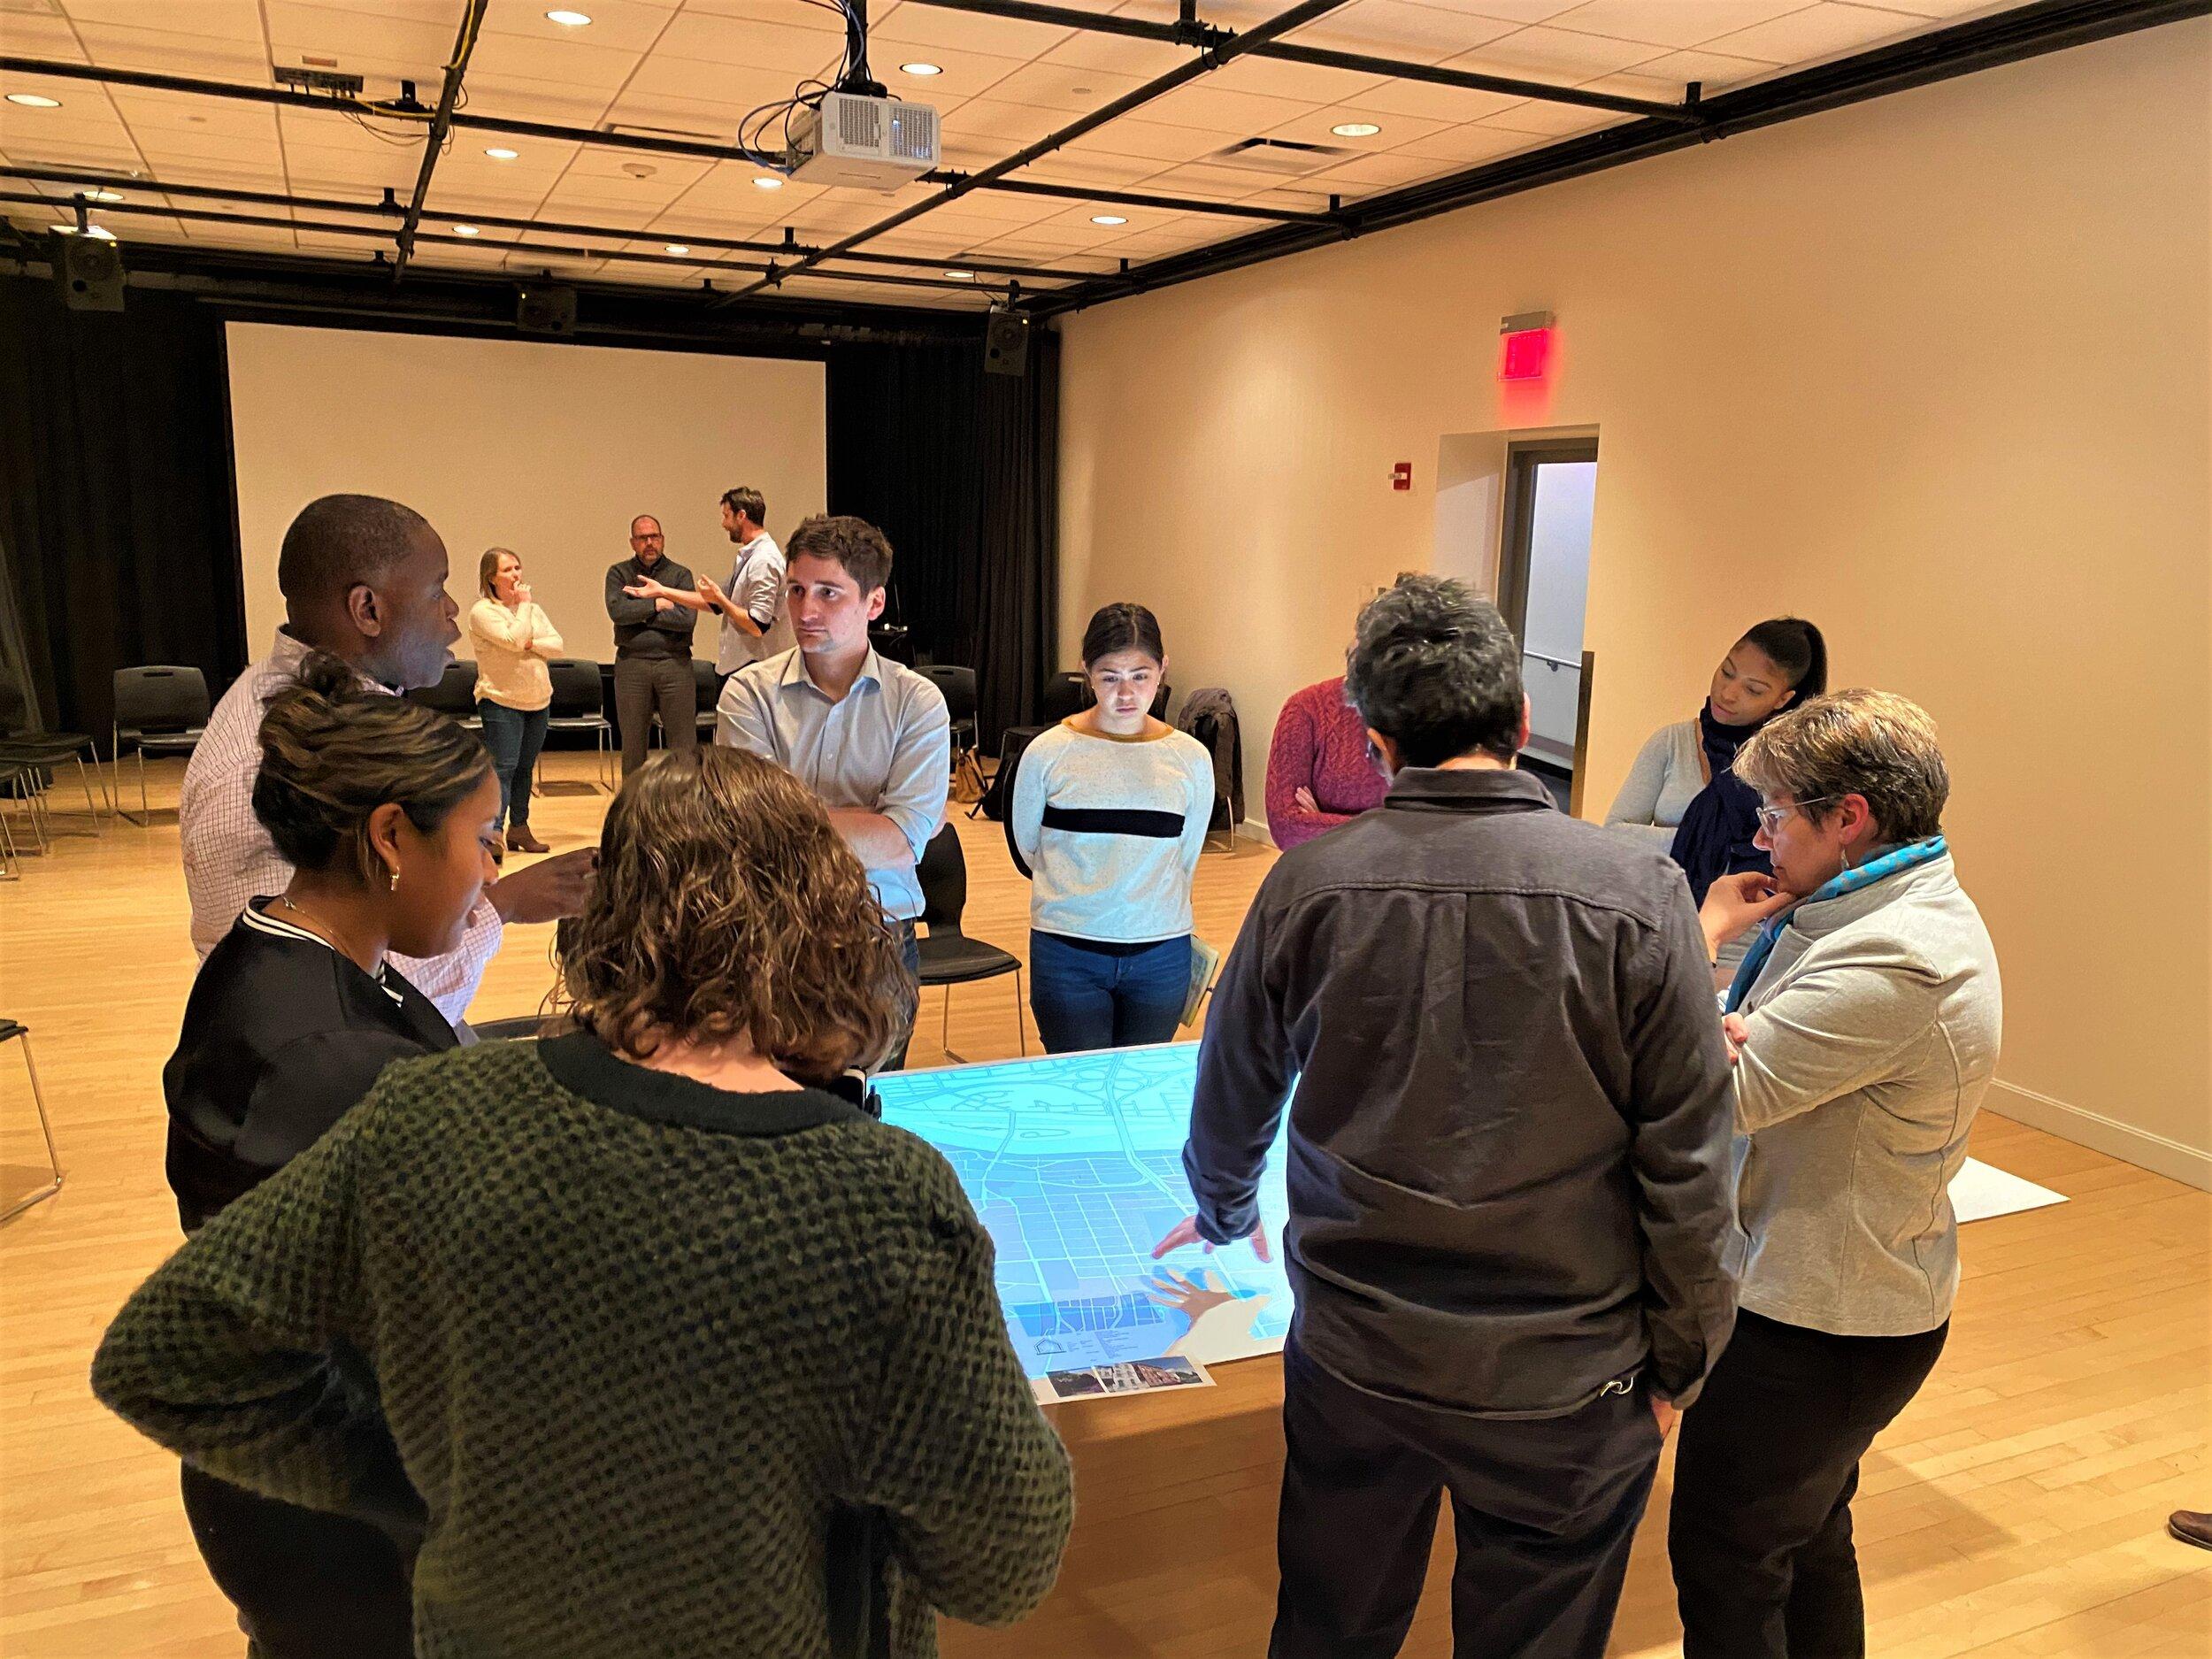 Urban Design Studio - Partnership between RPI School of Architecture. TAP Inc and Habitat — Habitat for Humanity Capital District